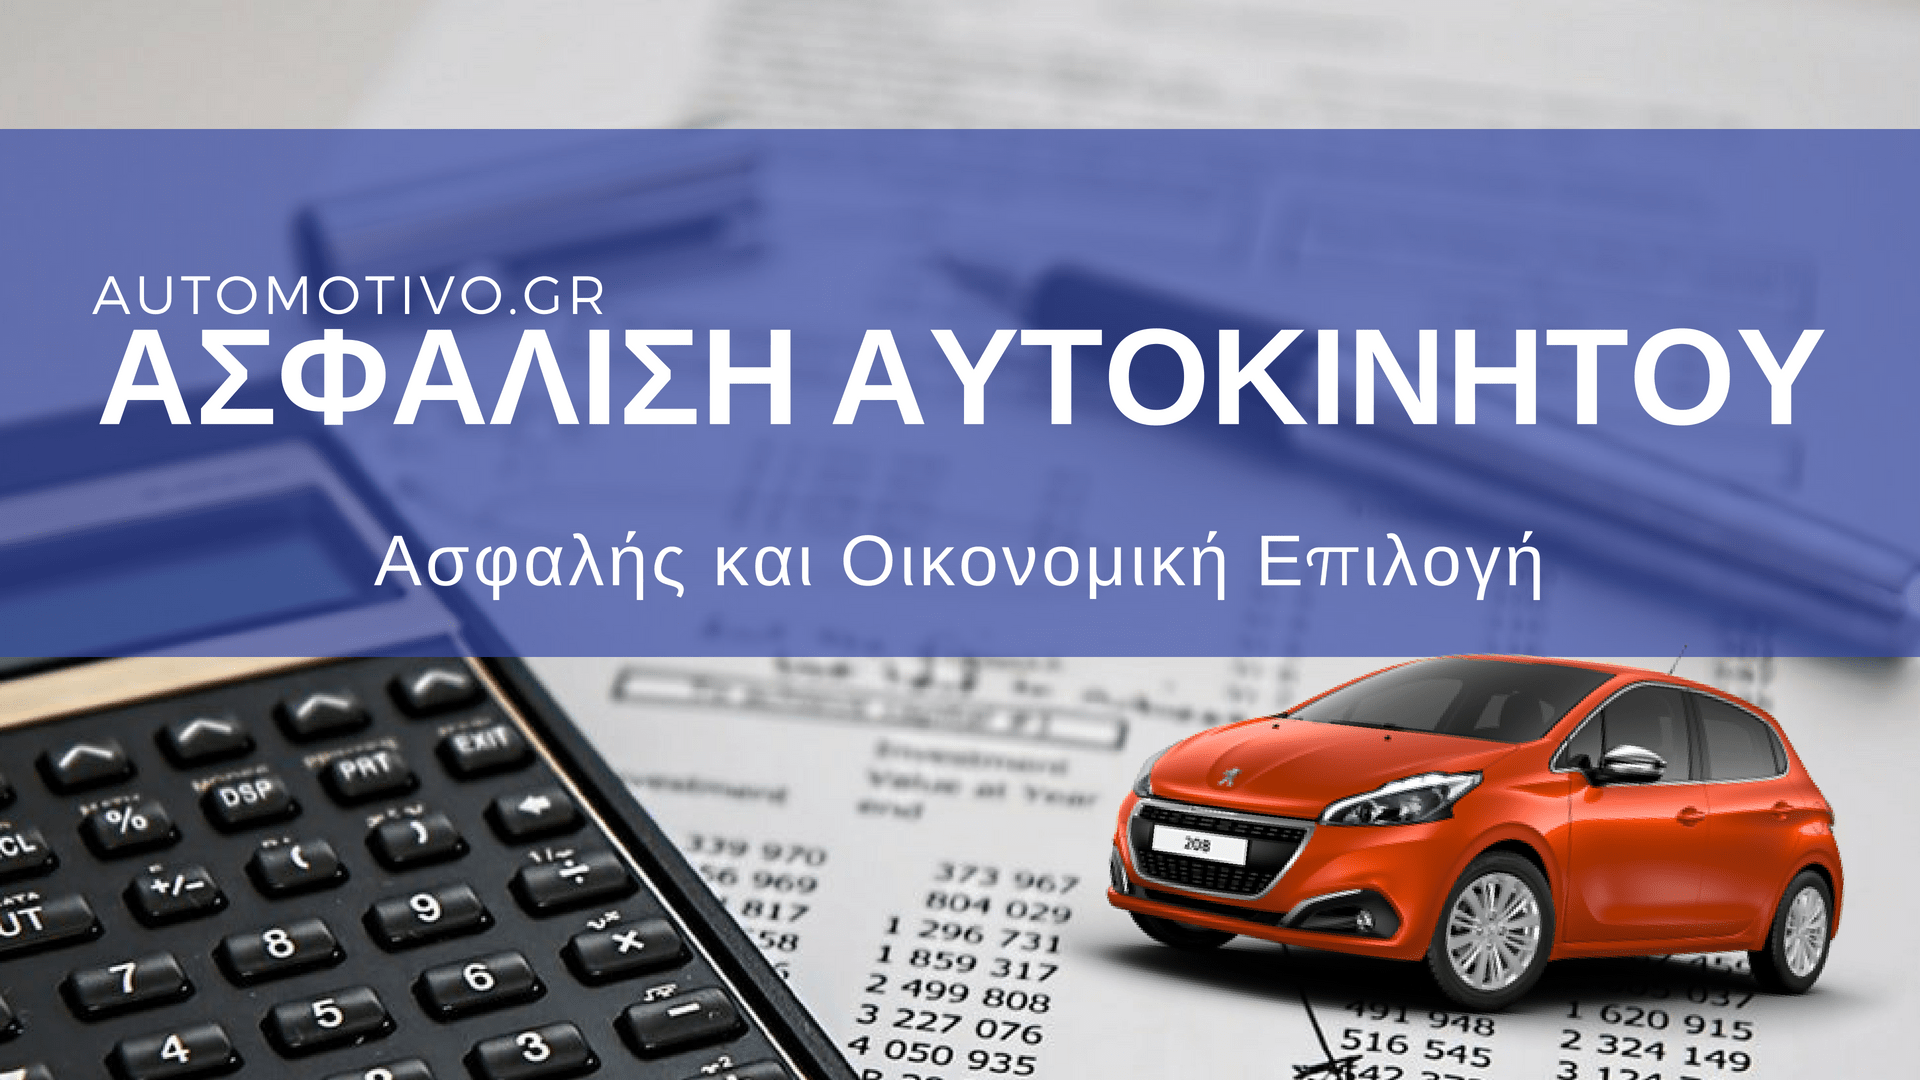 Automotivo Insurance